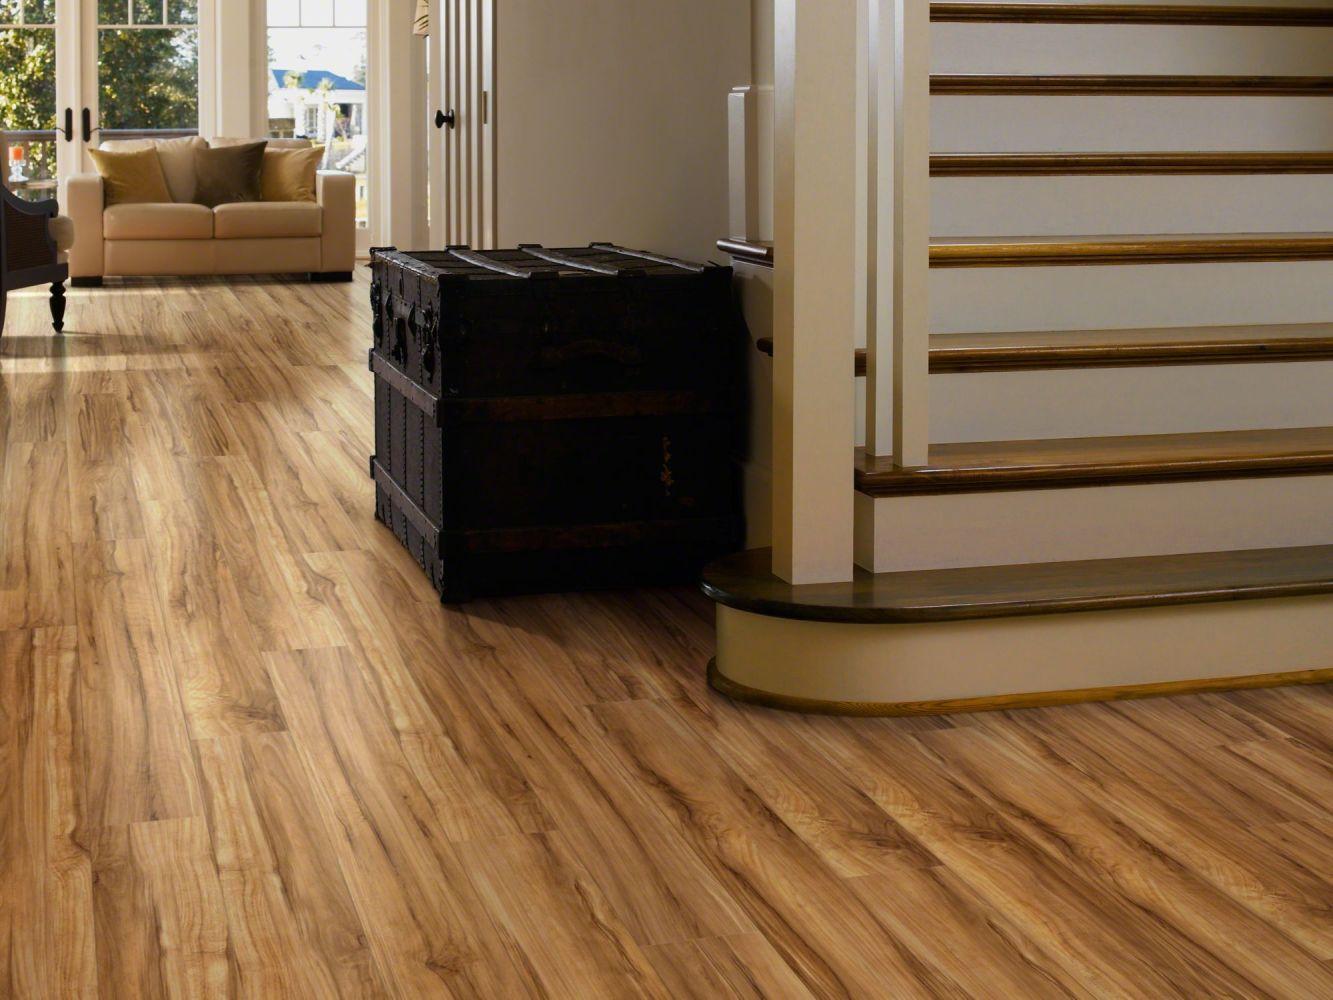 Shaw Floors Resilient Property Solutions Brava Plus Frutta 00609_VE345